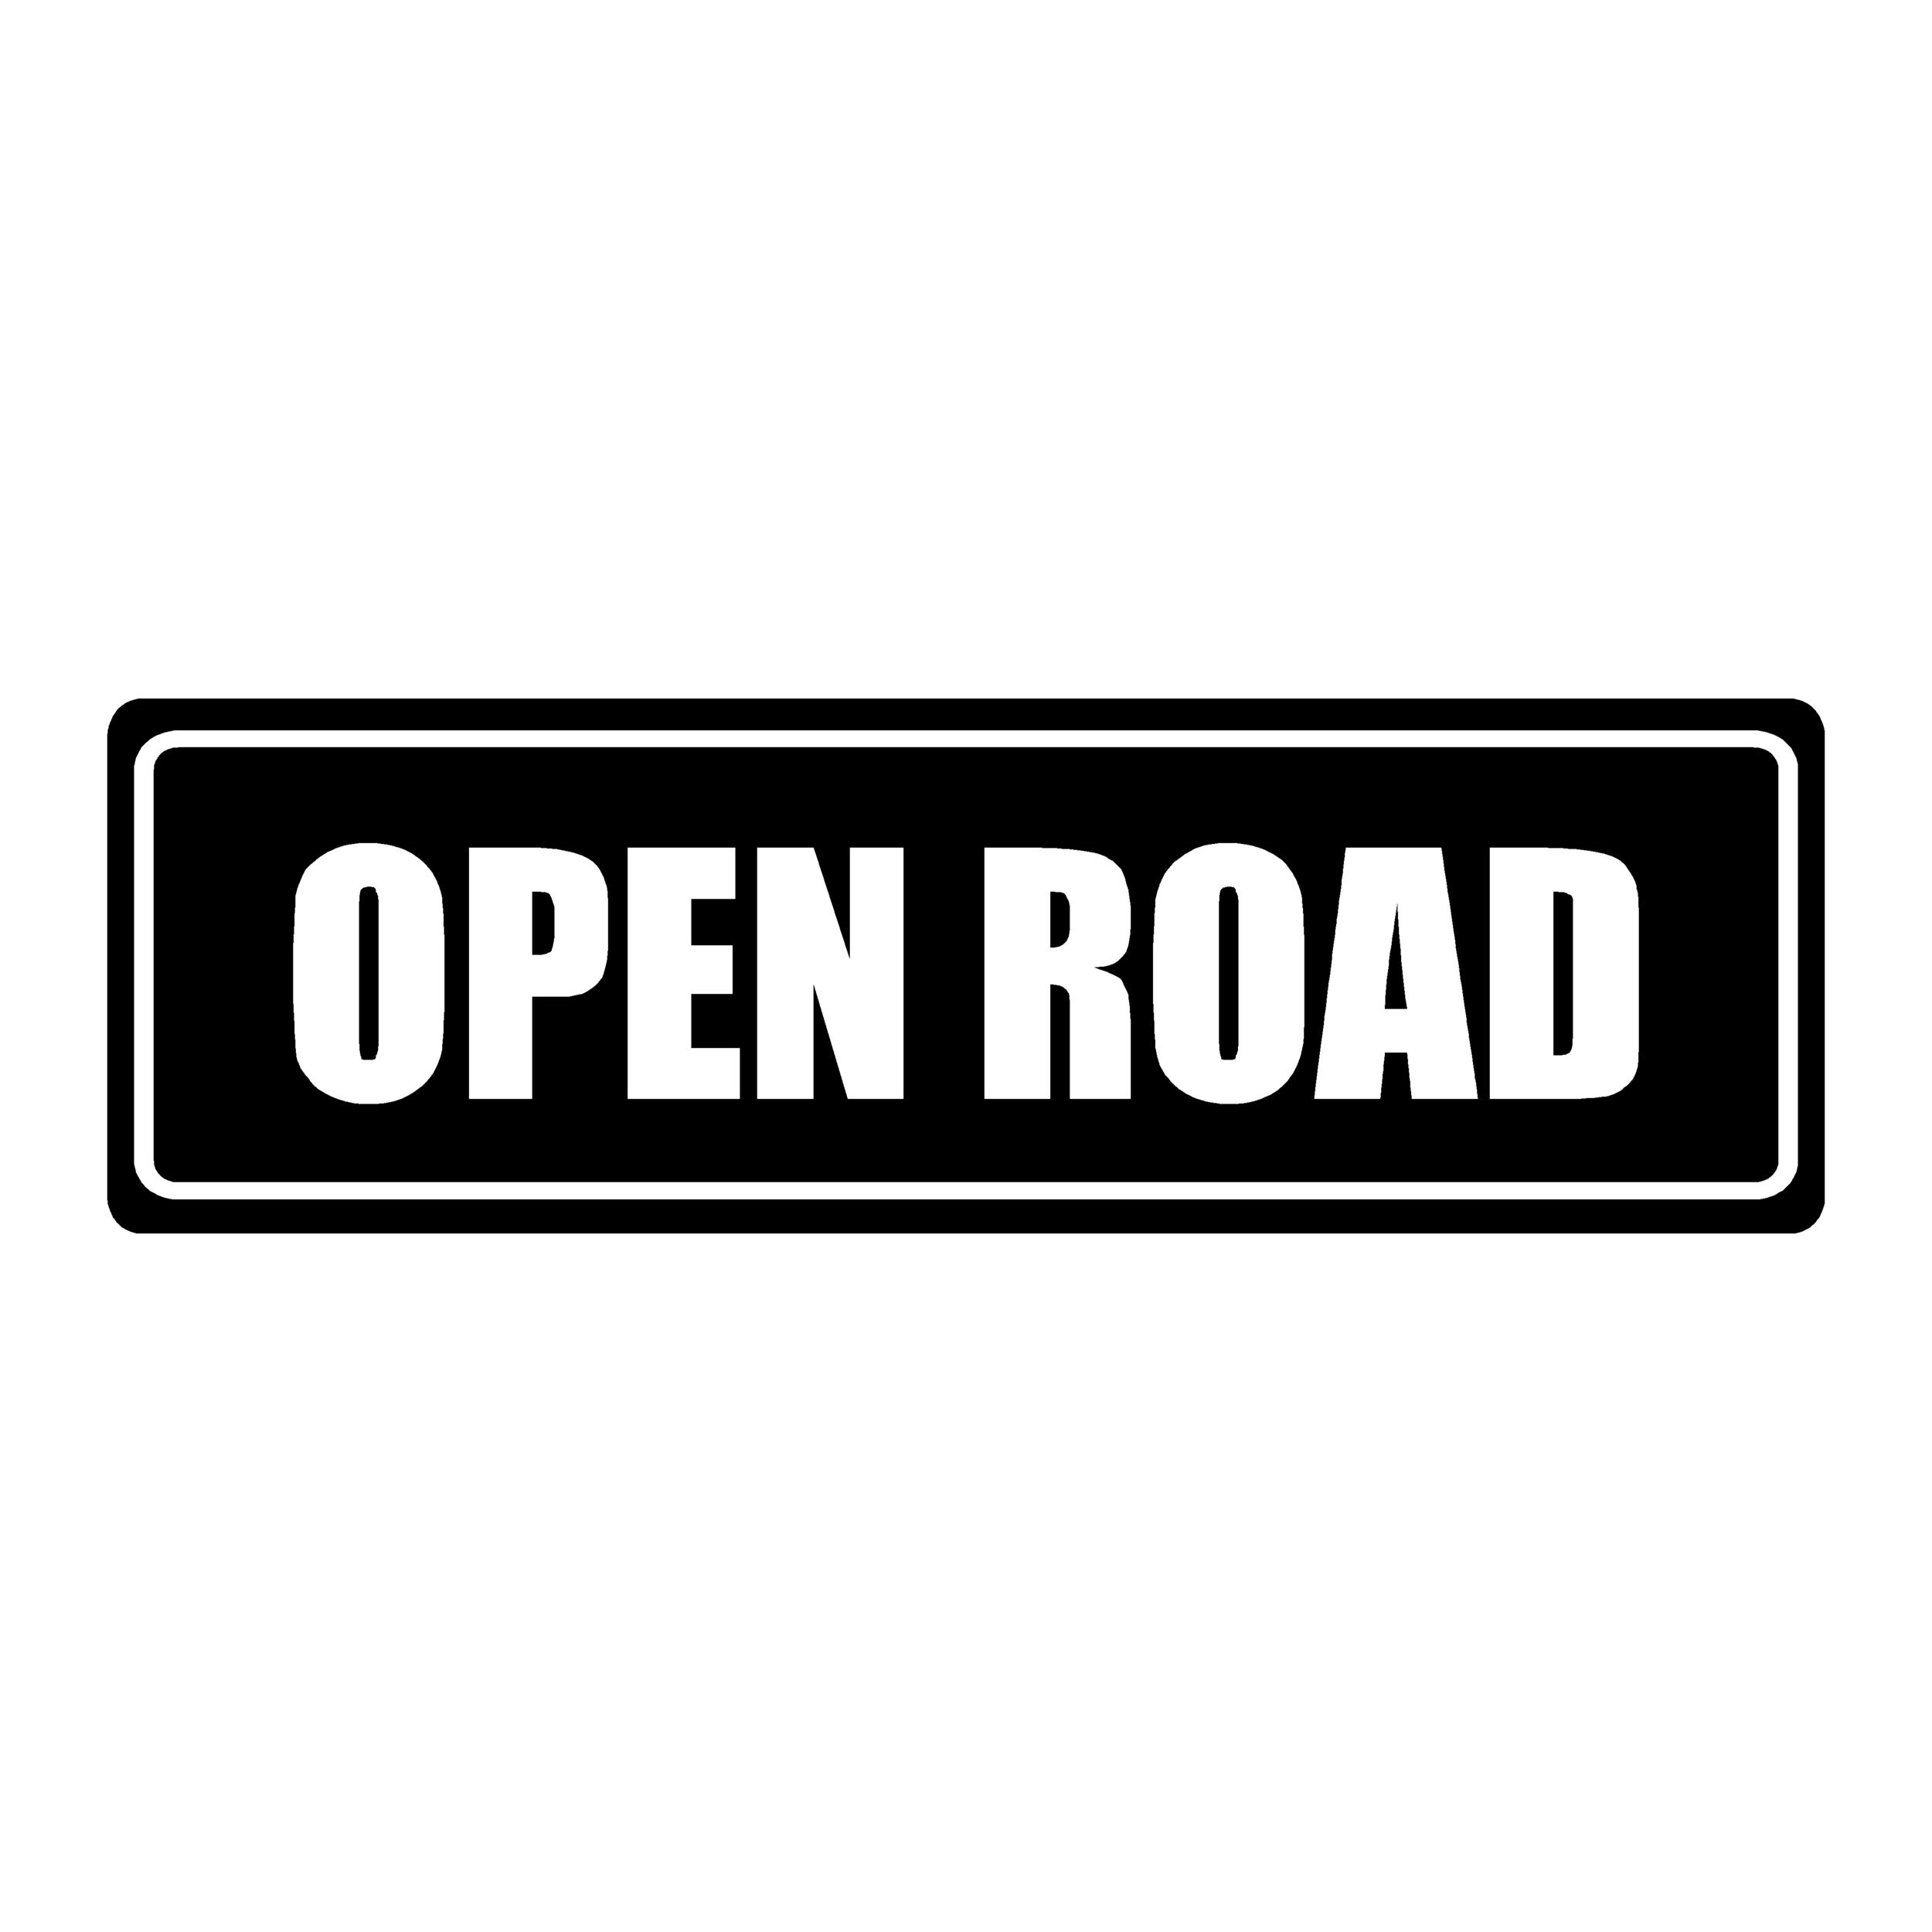 stickers open road ref 1 tuning amortisseur 4x4 tout terrain car auto moto camion competition deco rallye autocollant